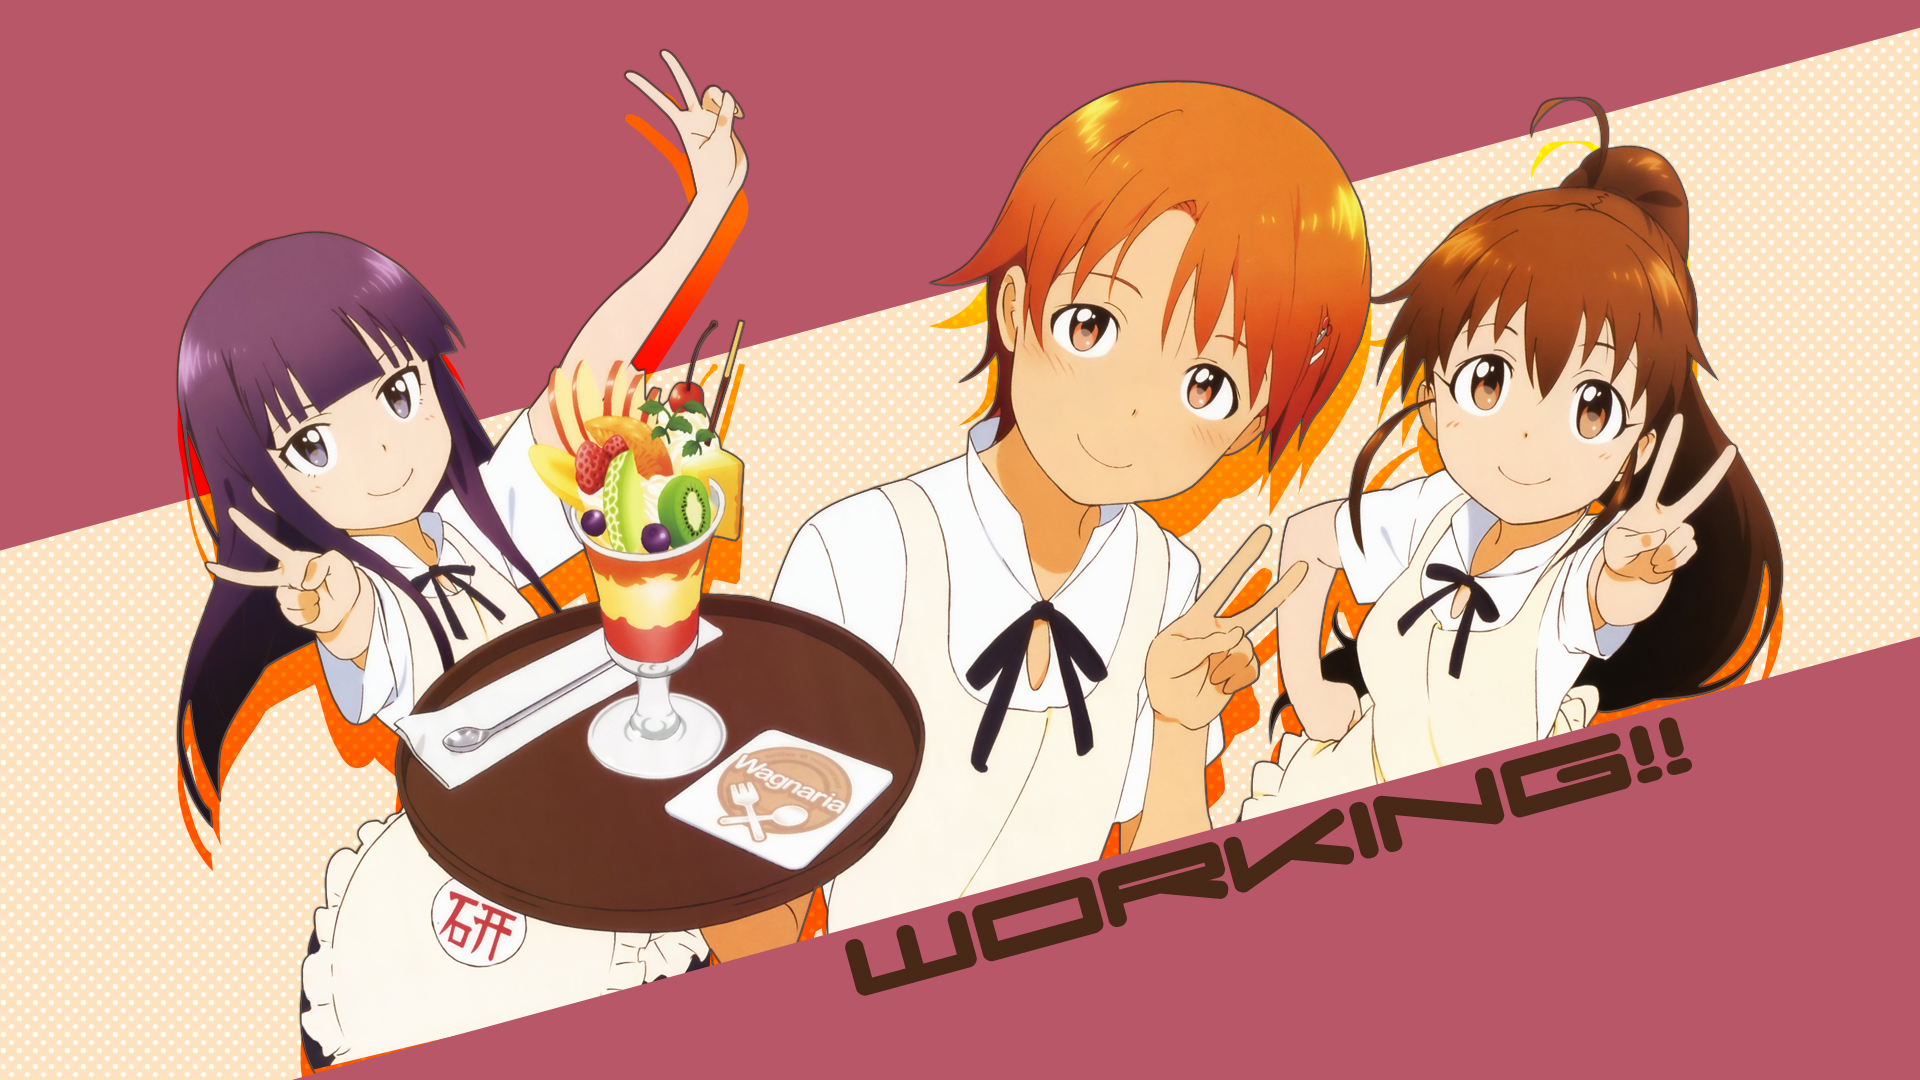 Tags Anime Adachi Shingo Working Yamada Aoi Taneshima Popura